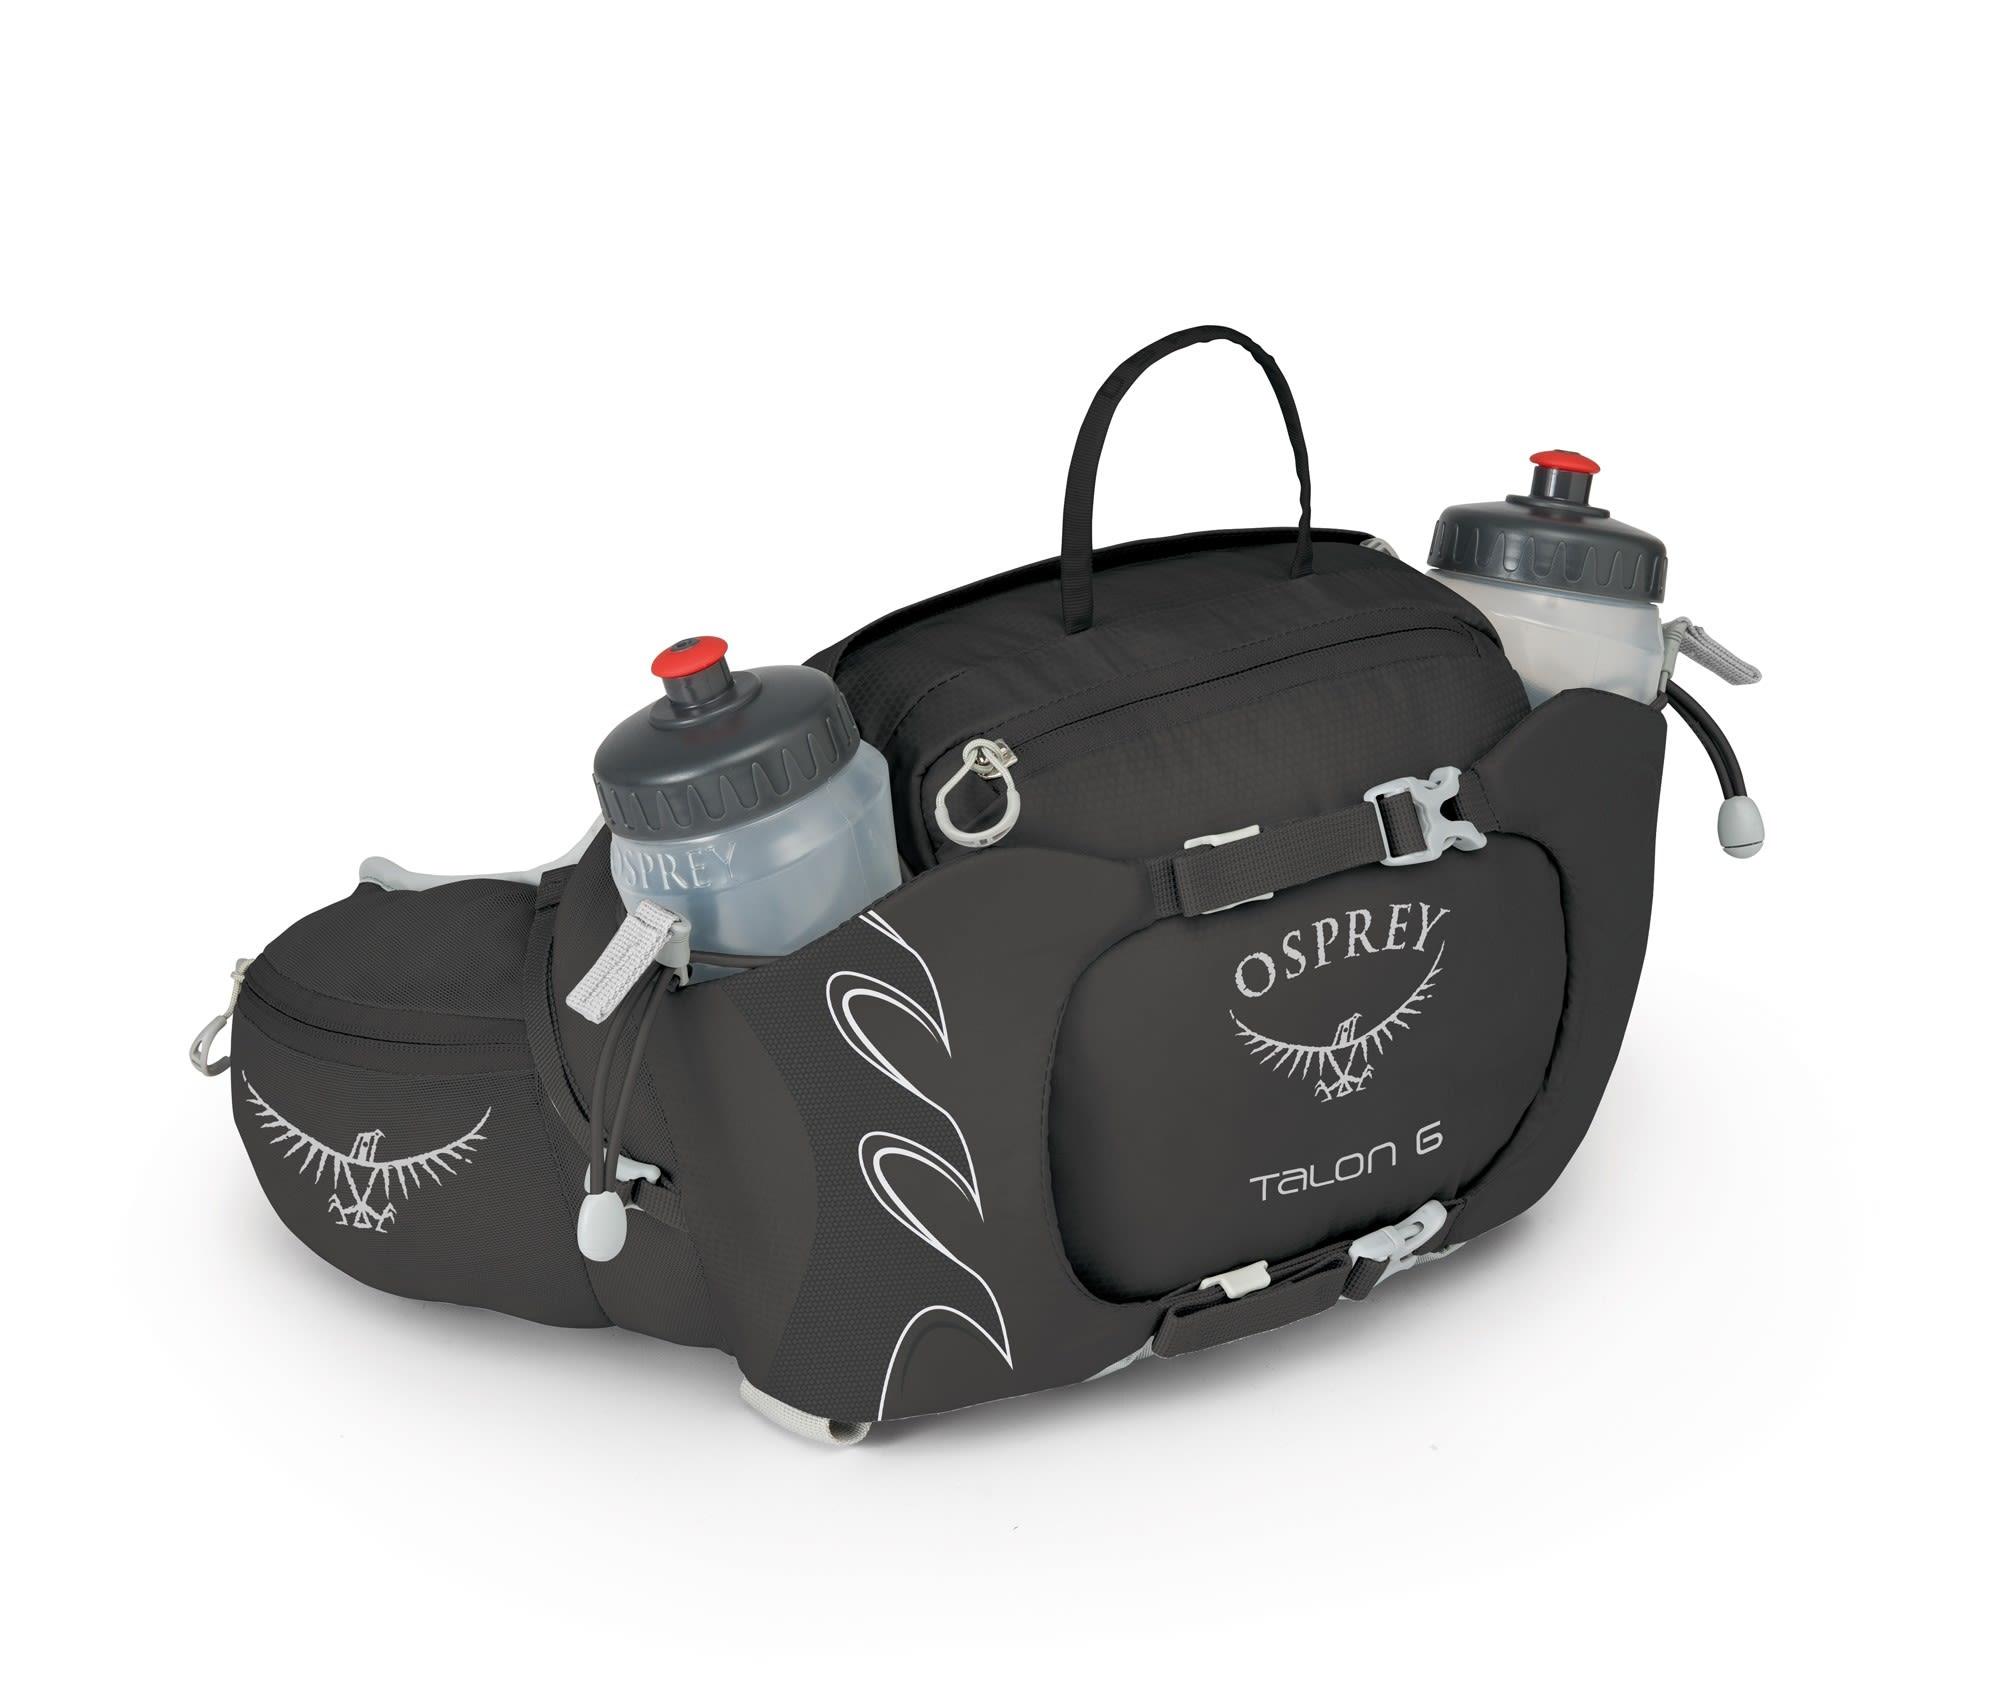 Osprey Talon 6   Größe One Size   Herren Gürtel- & Hüfttasche